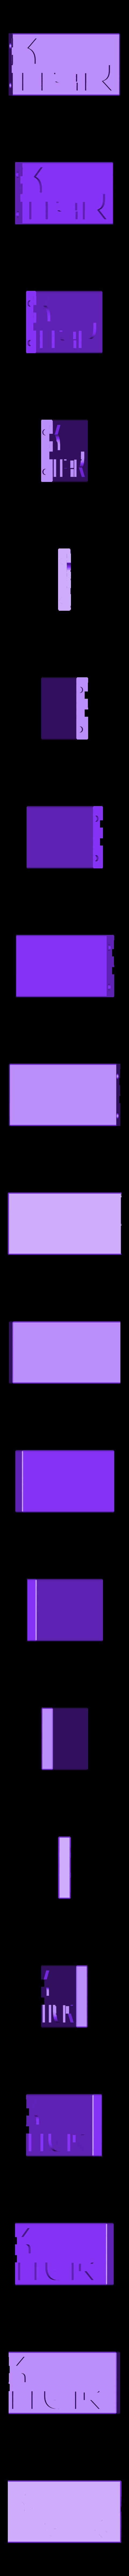 DM_Background_R_01.stl Download free STL file Dark Matter - Main Title Logo • 3D printer object, SYFY